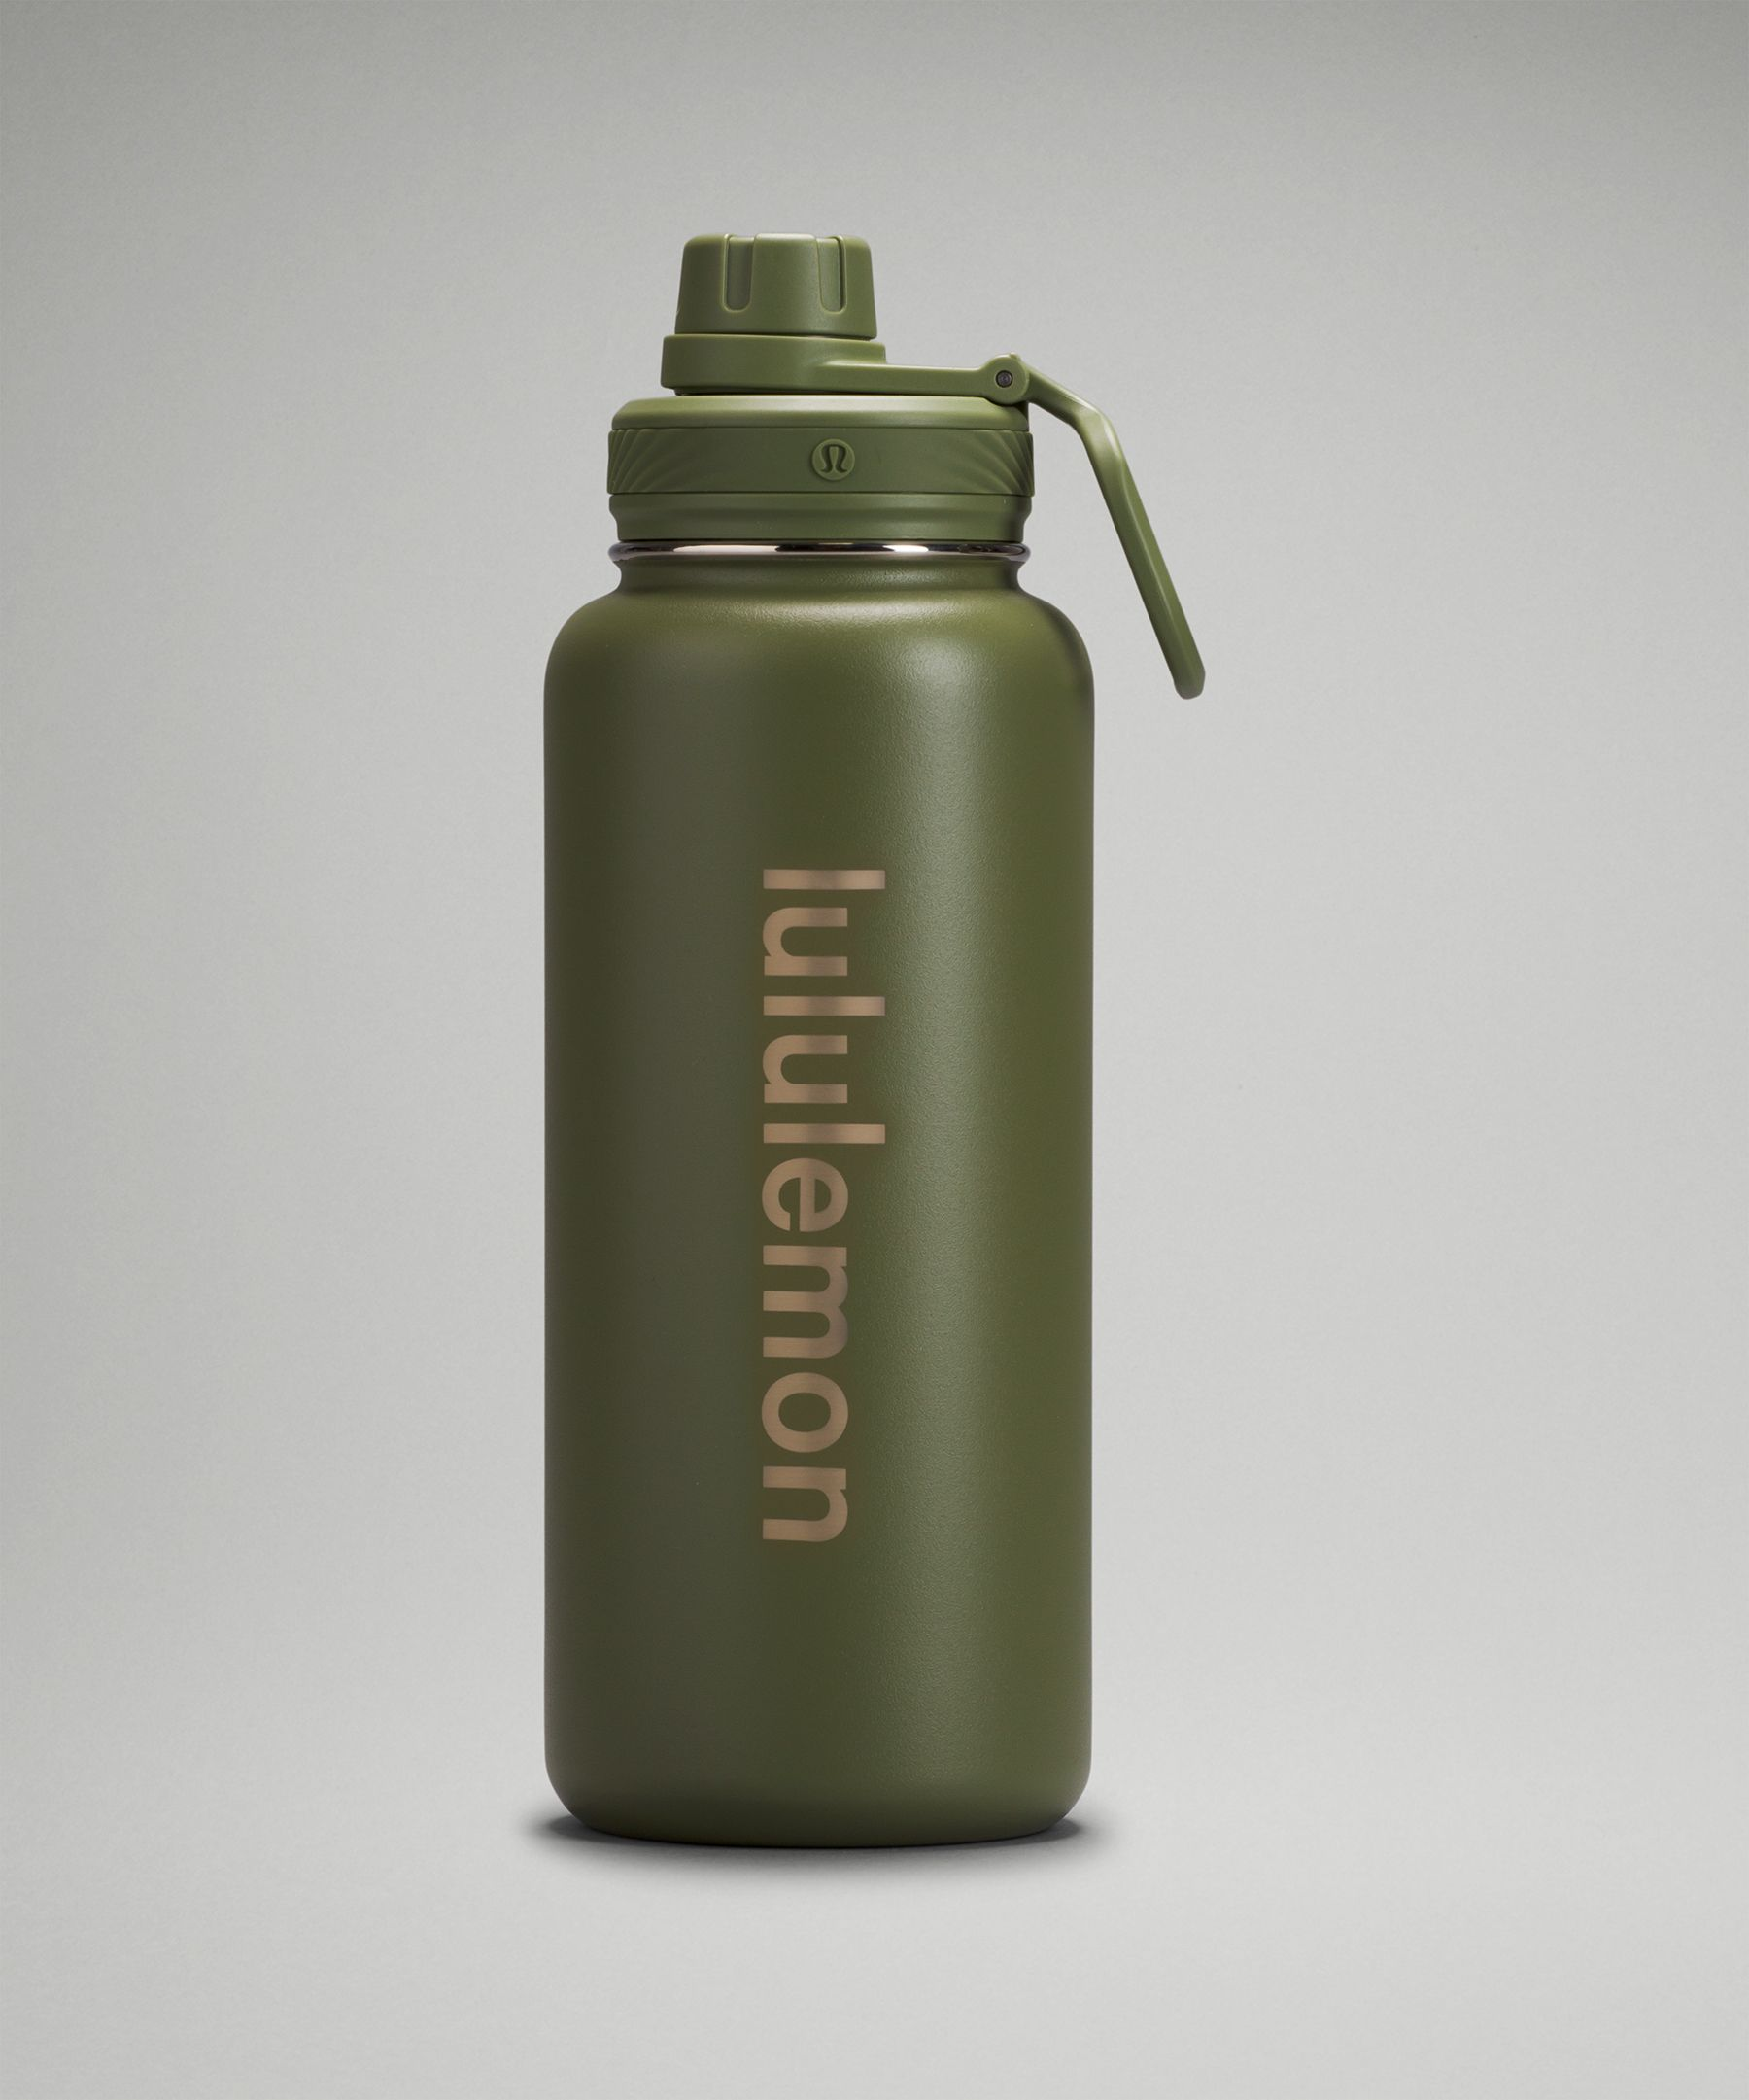 Lululemon Back to Life Sport Bottle 32oz